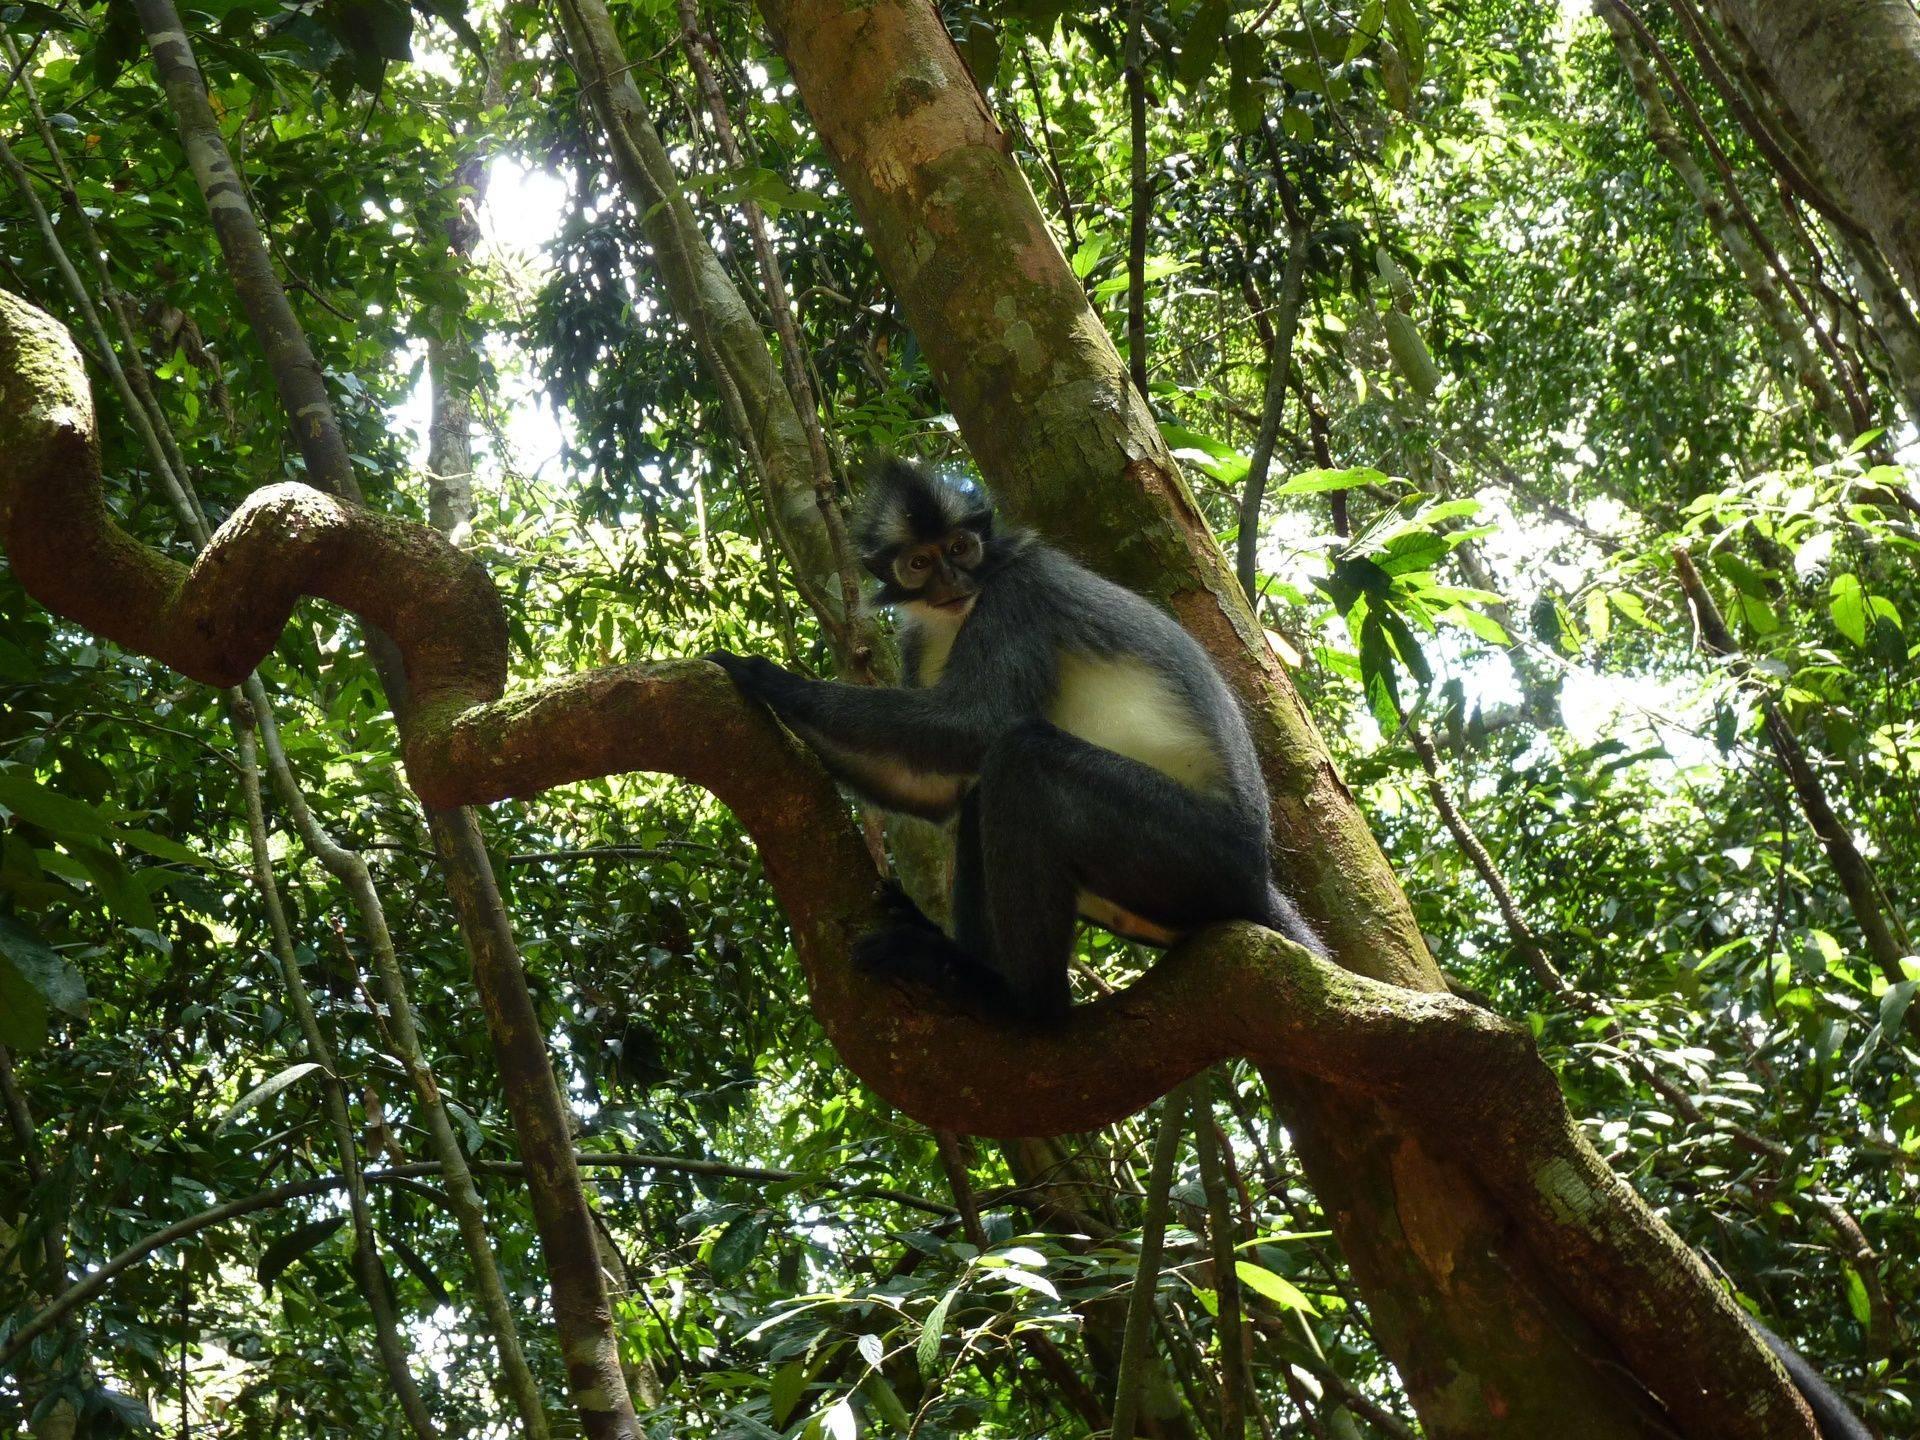 Jungle wildlife